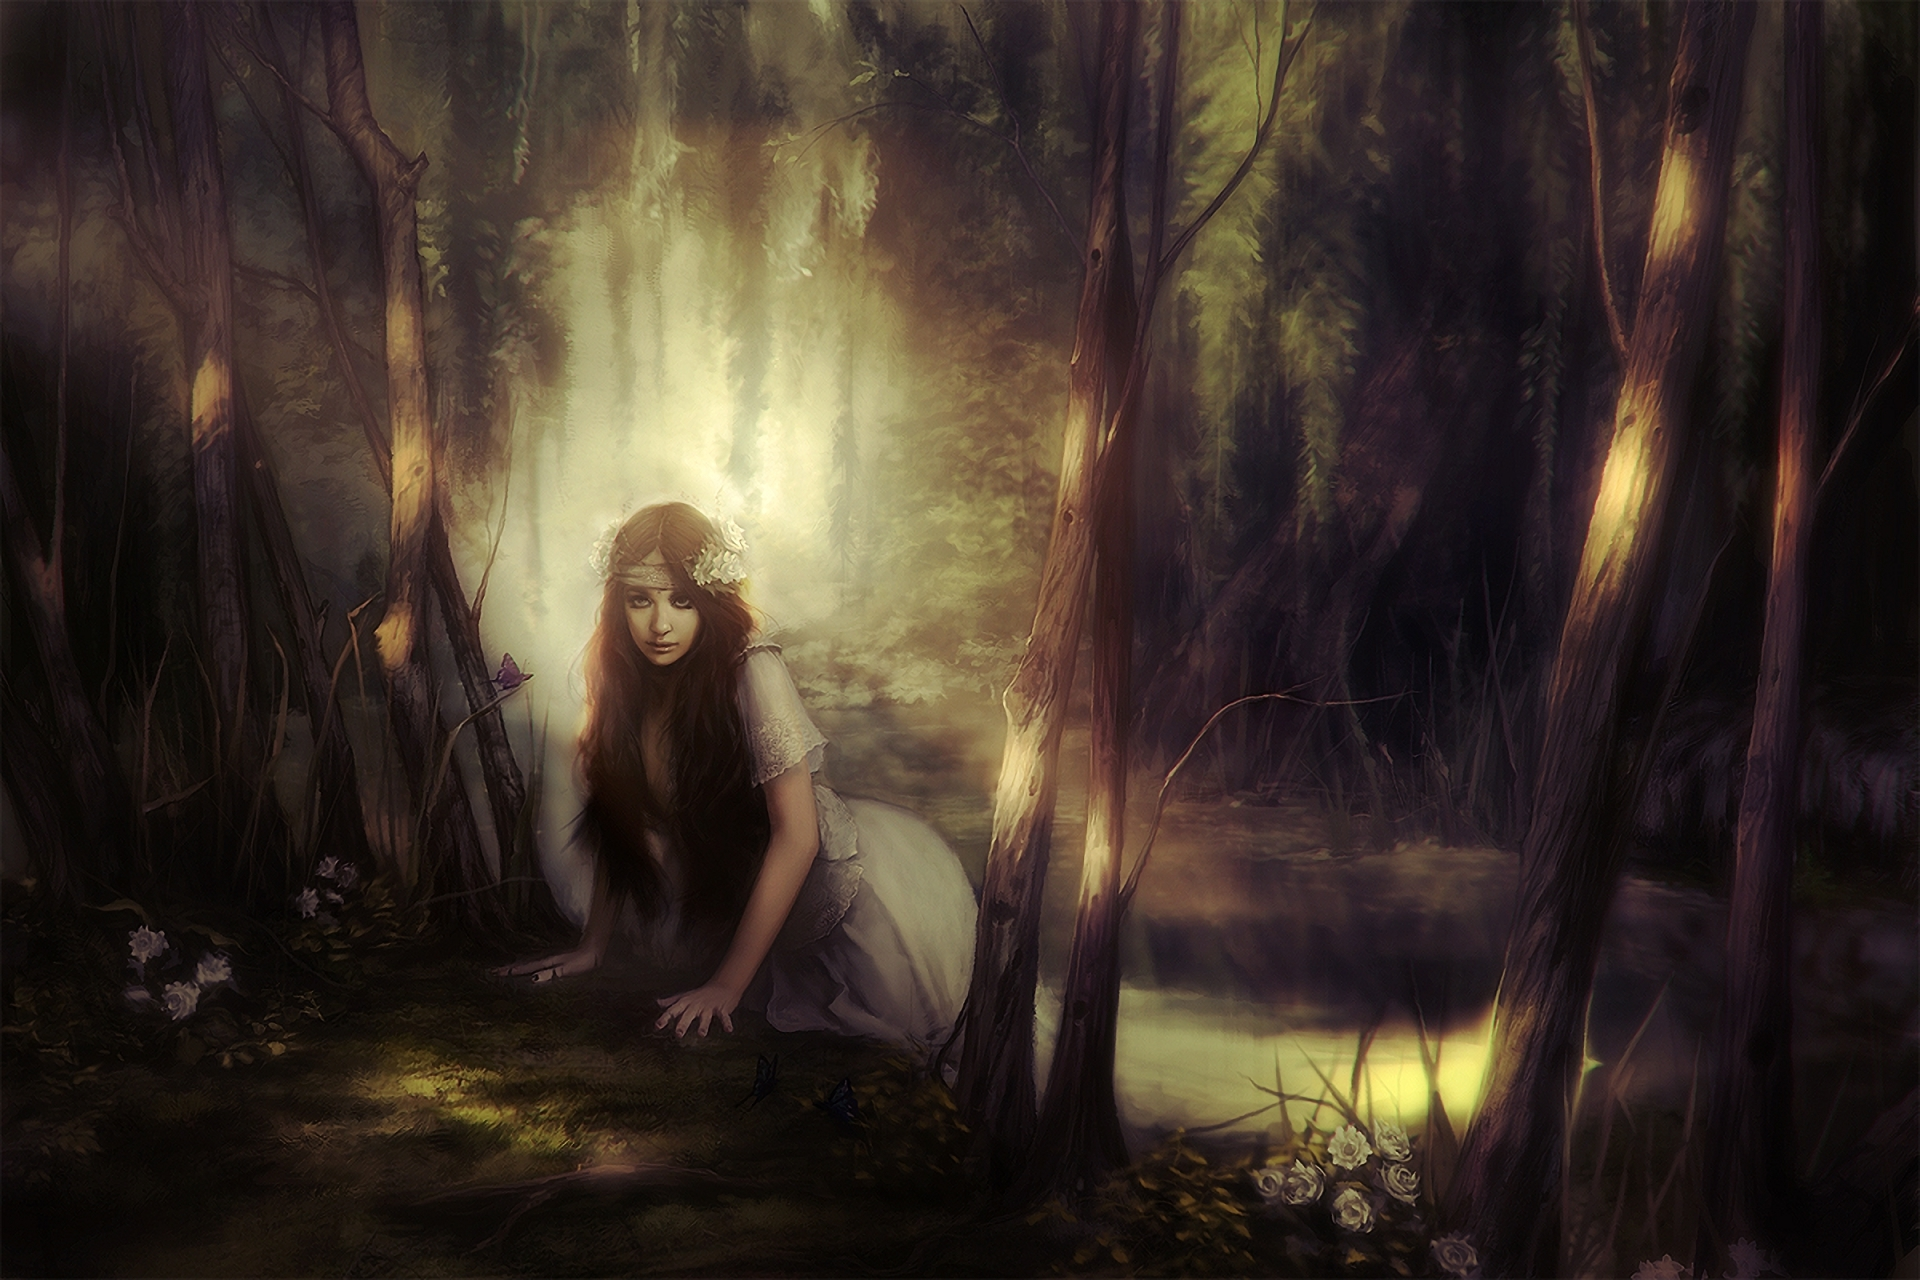 Девушка дерево улыбка лес Girl tree smile forest без смс